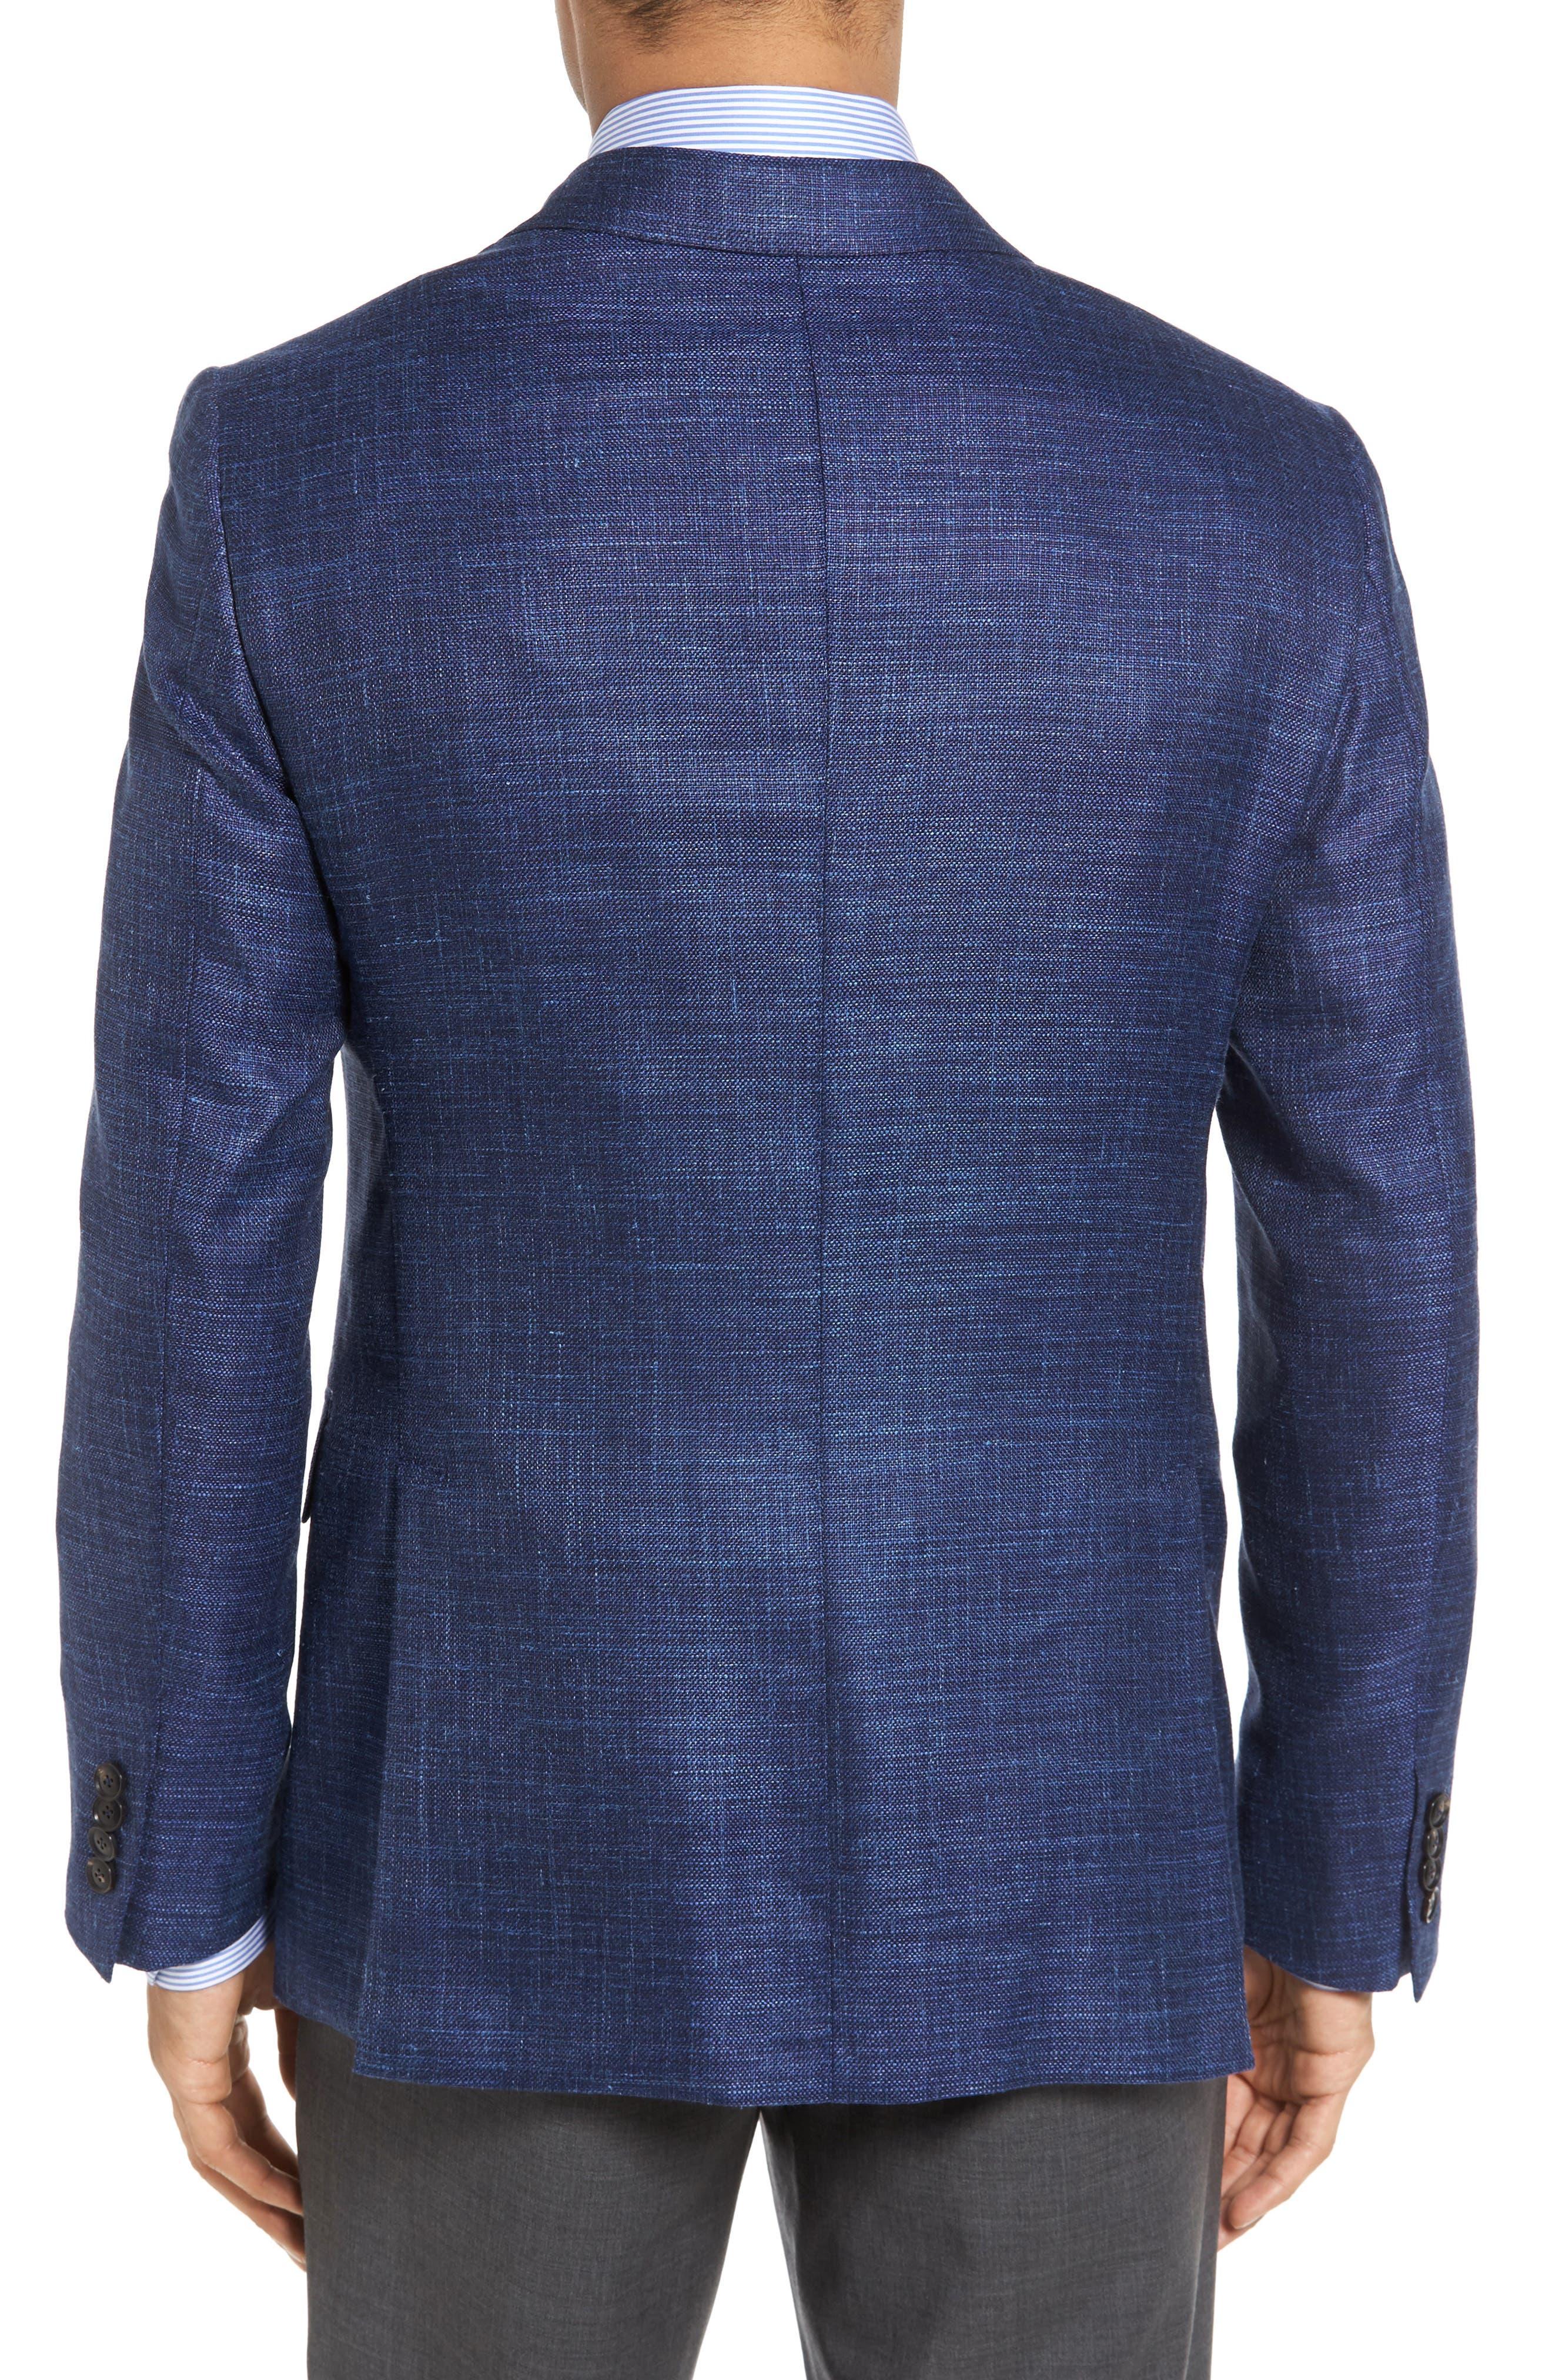 Plaid Wool Blend Blazer,                             Alternate thumbnail 2, color,                             400